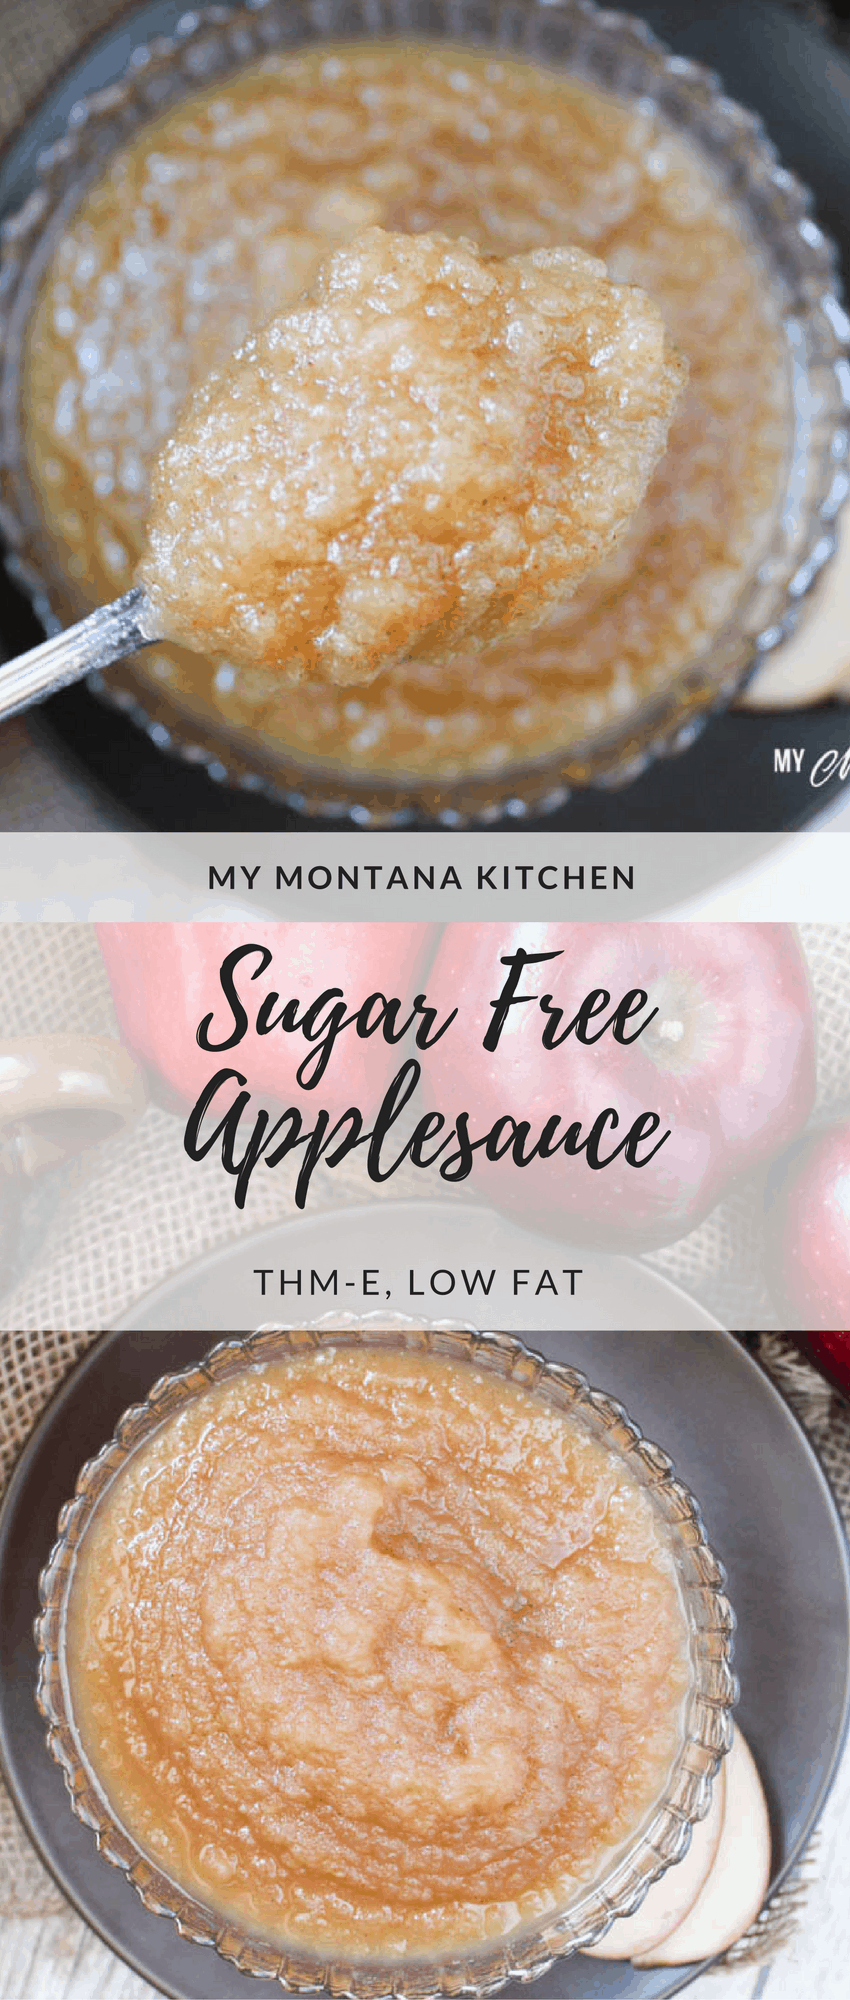 Sugar Free Applesauce (THM-E) #trimhealthymama #thm #thme #healthycarbs #sugarfree #applesauce